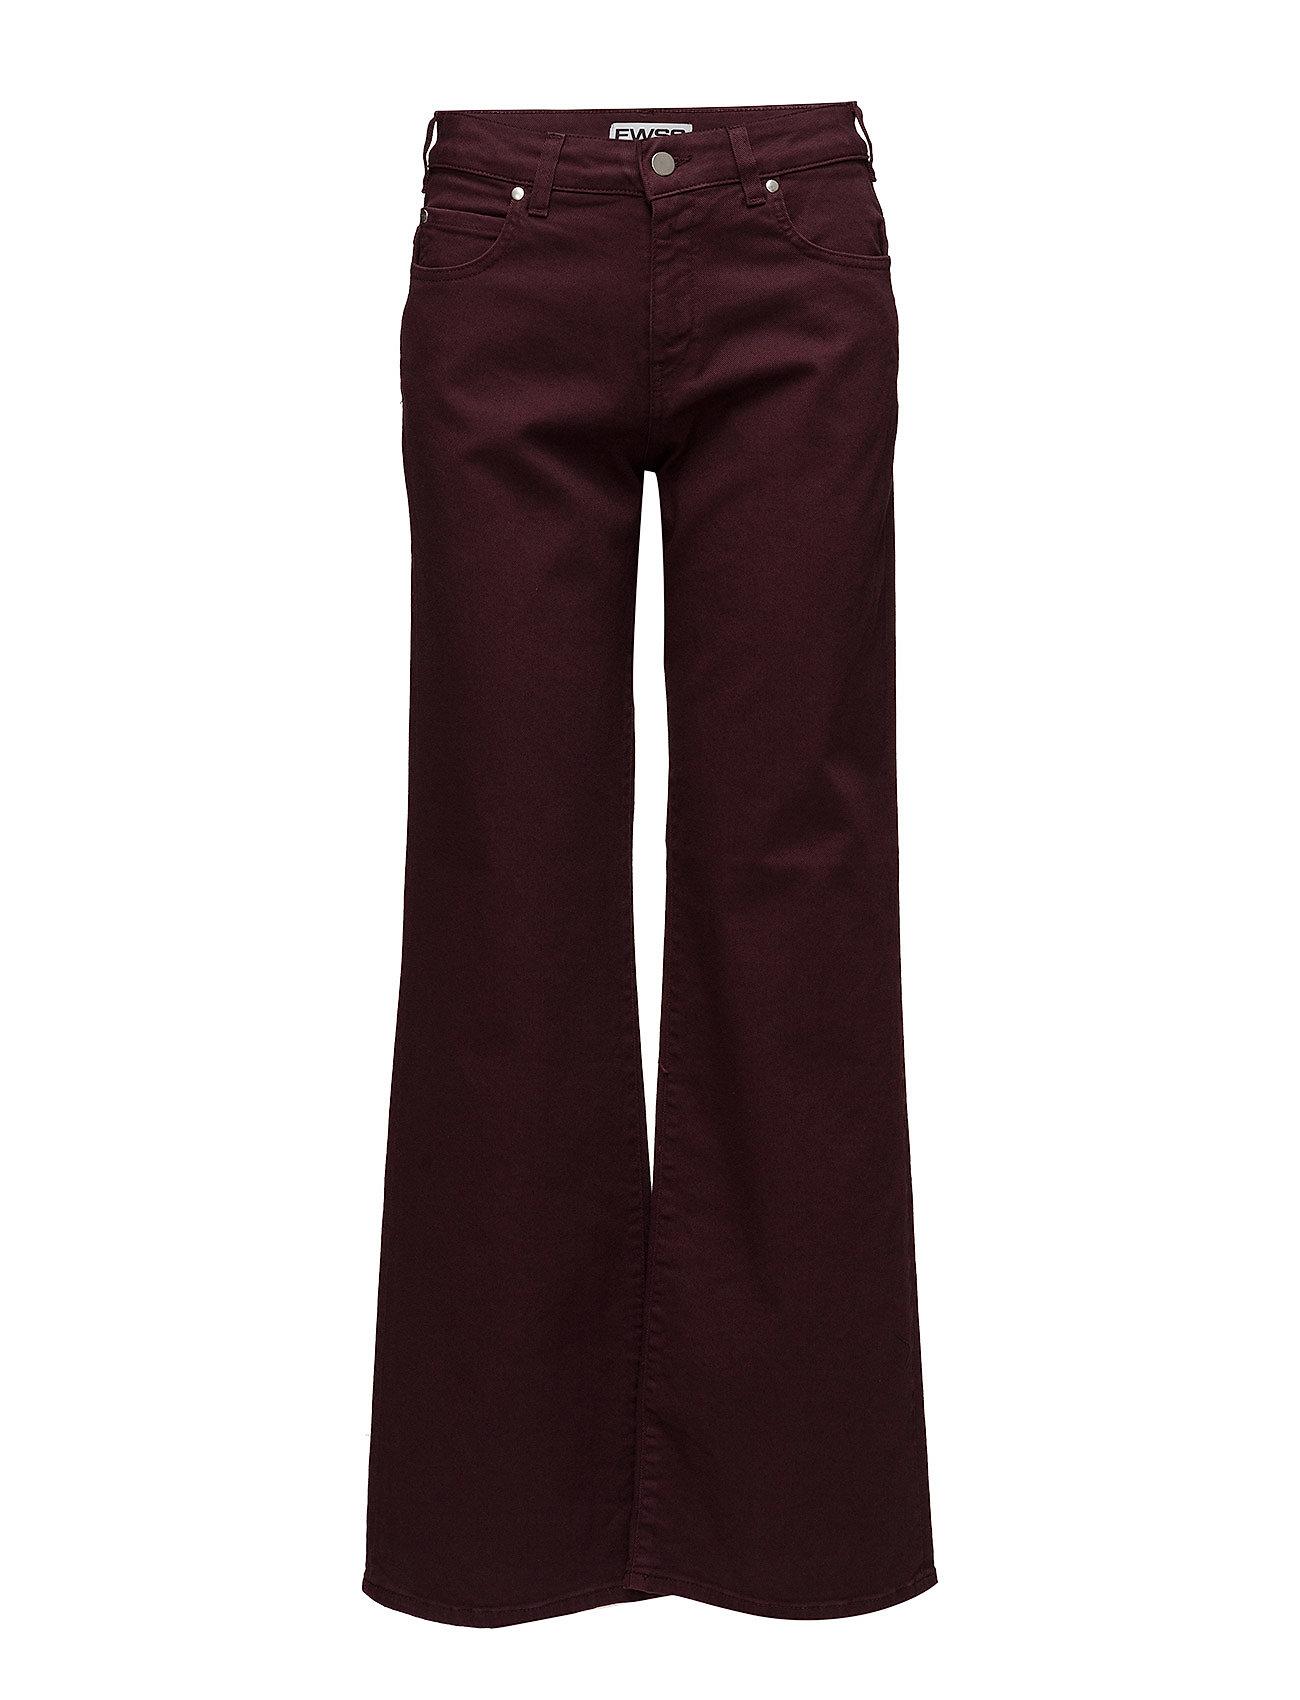 Fall Winter Spring Summer Erna Jeans